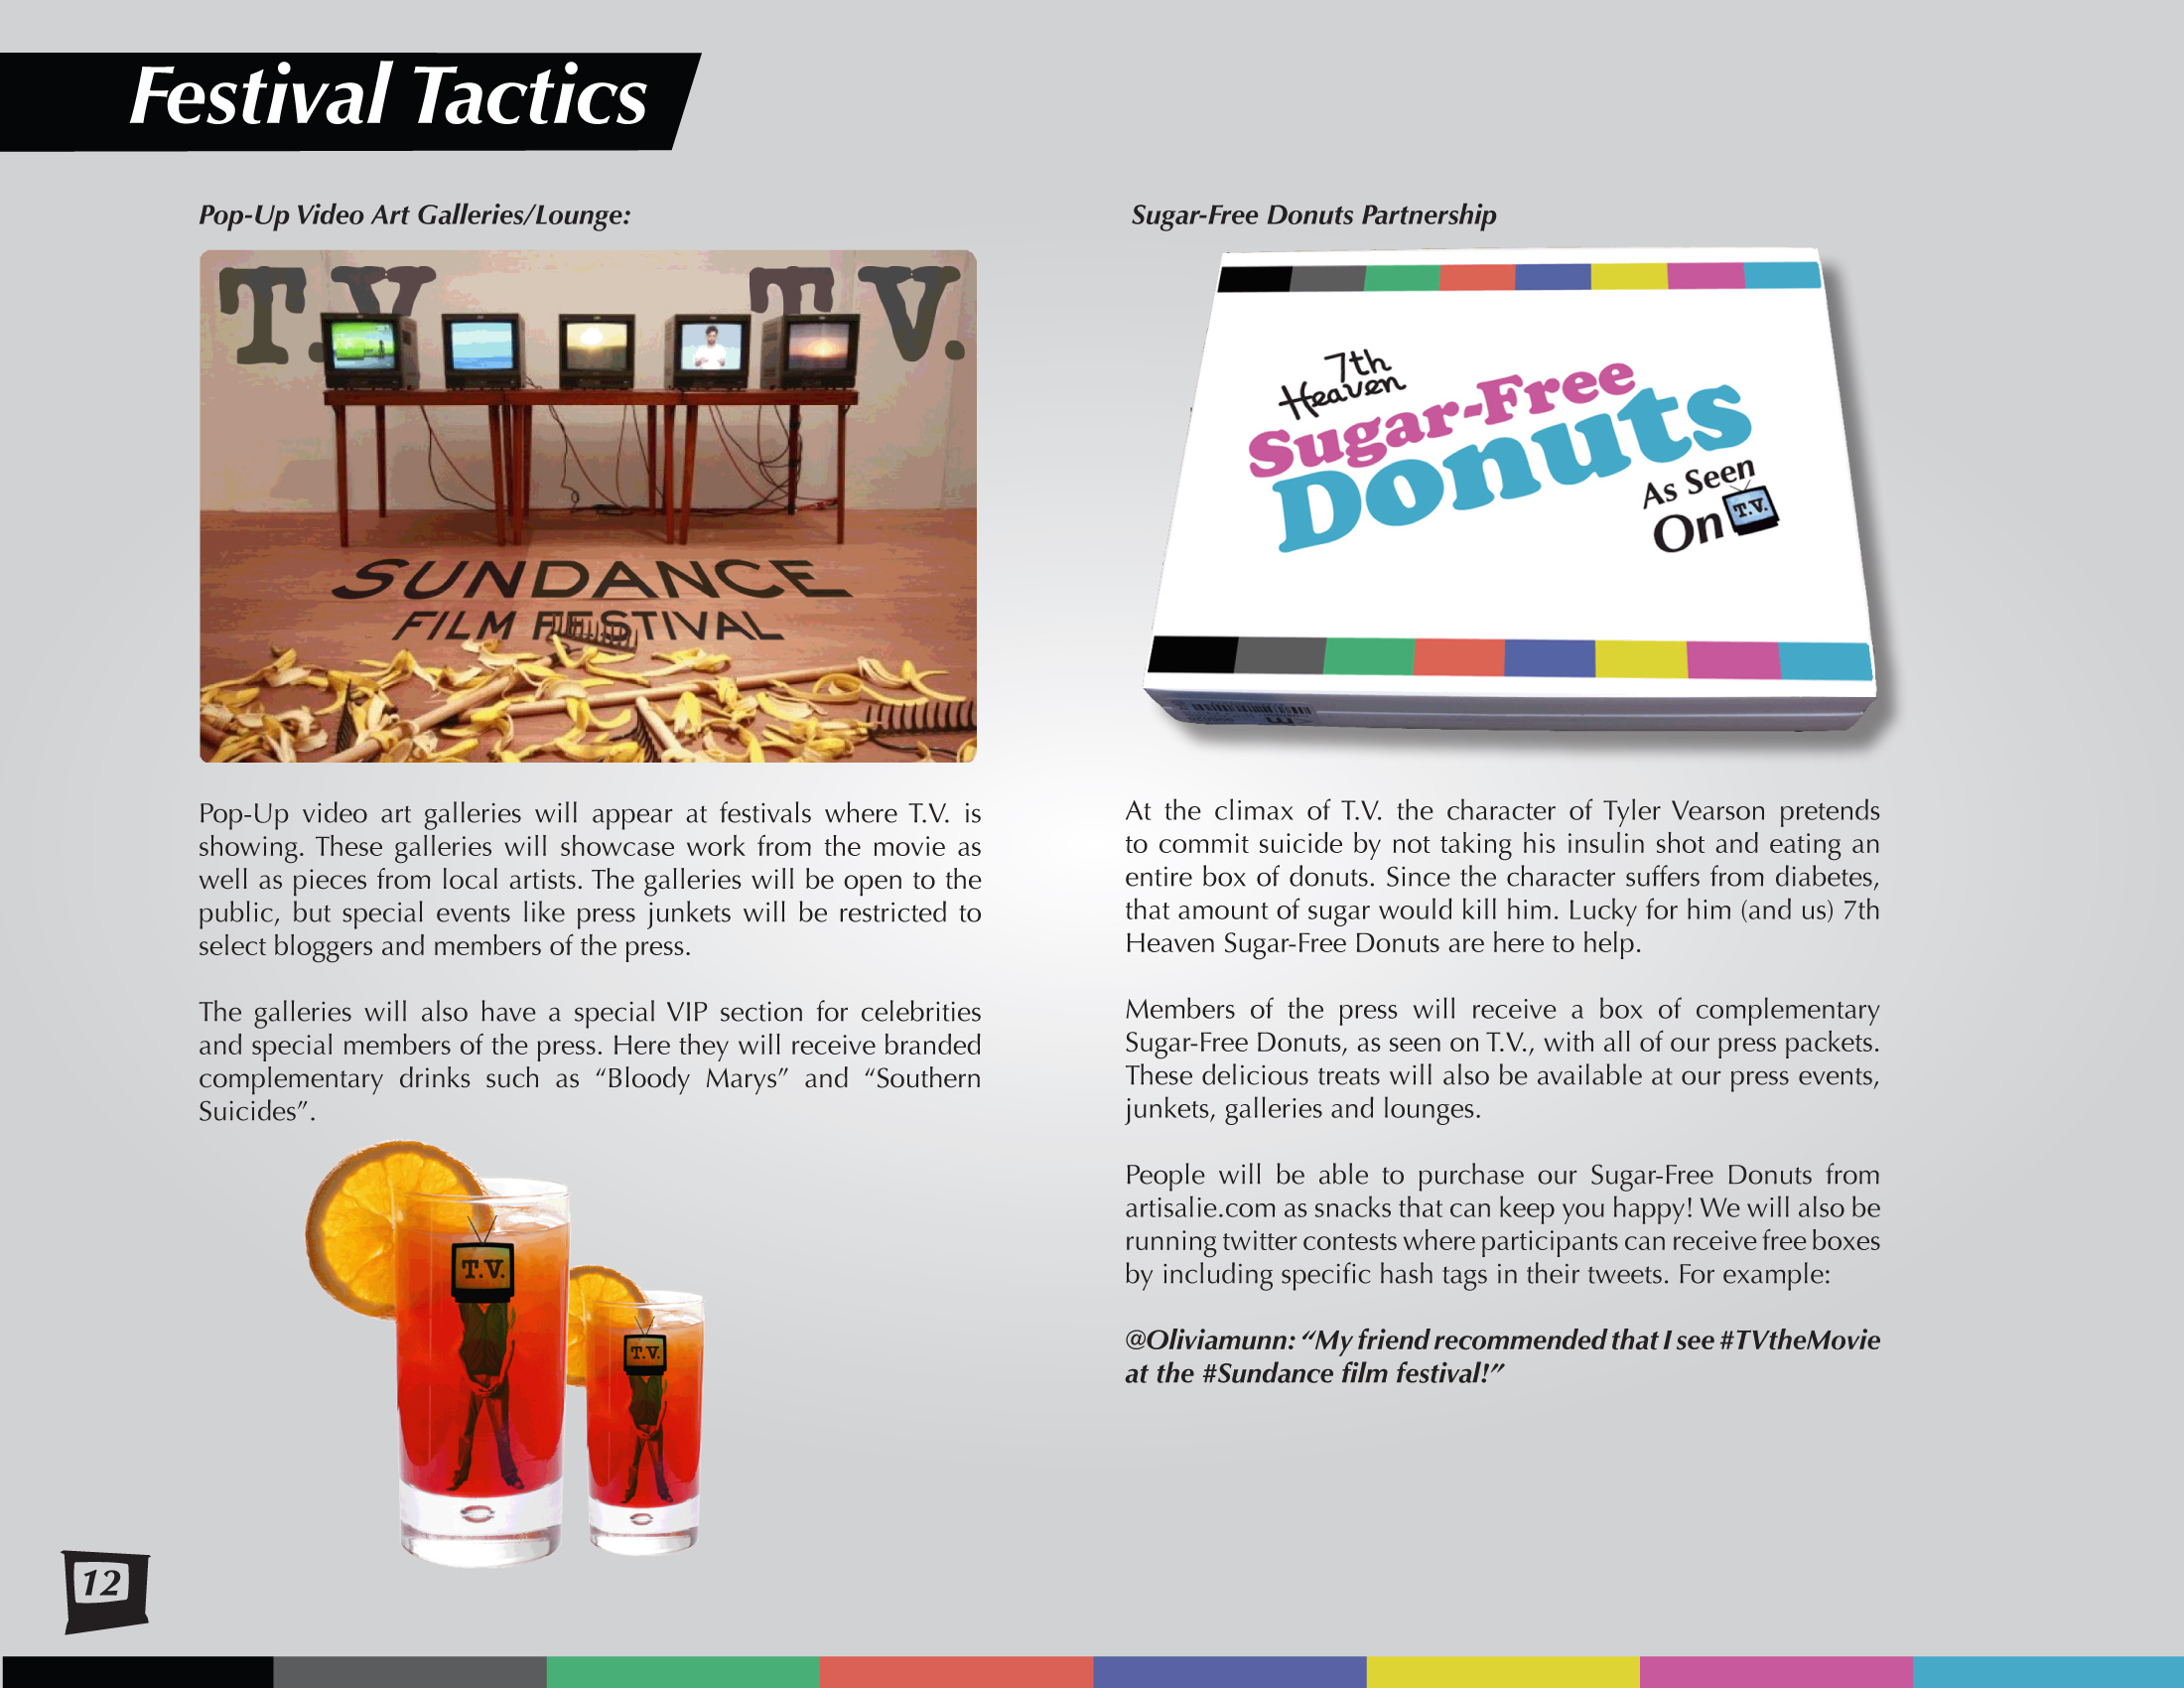 Sample Page: Festival Tactics